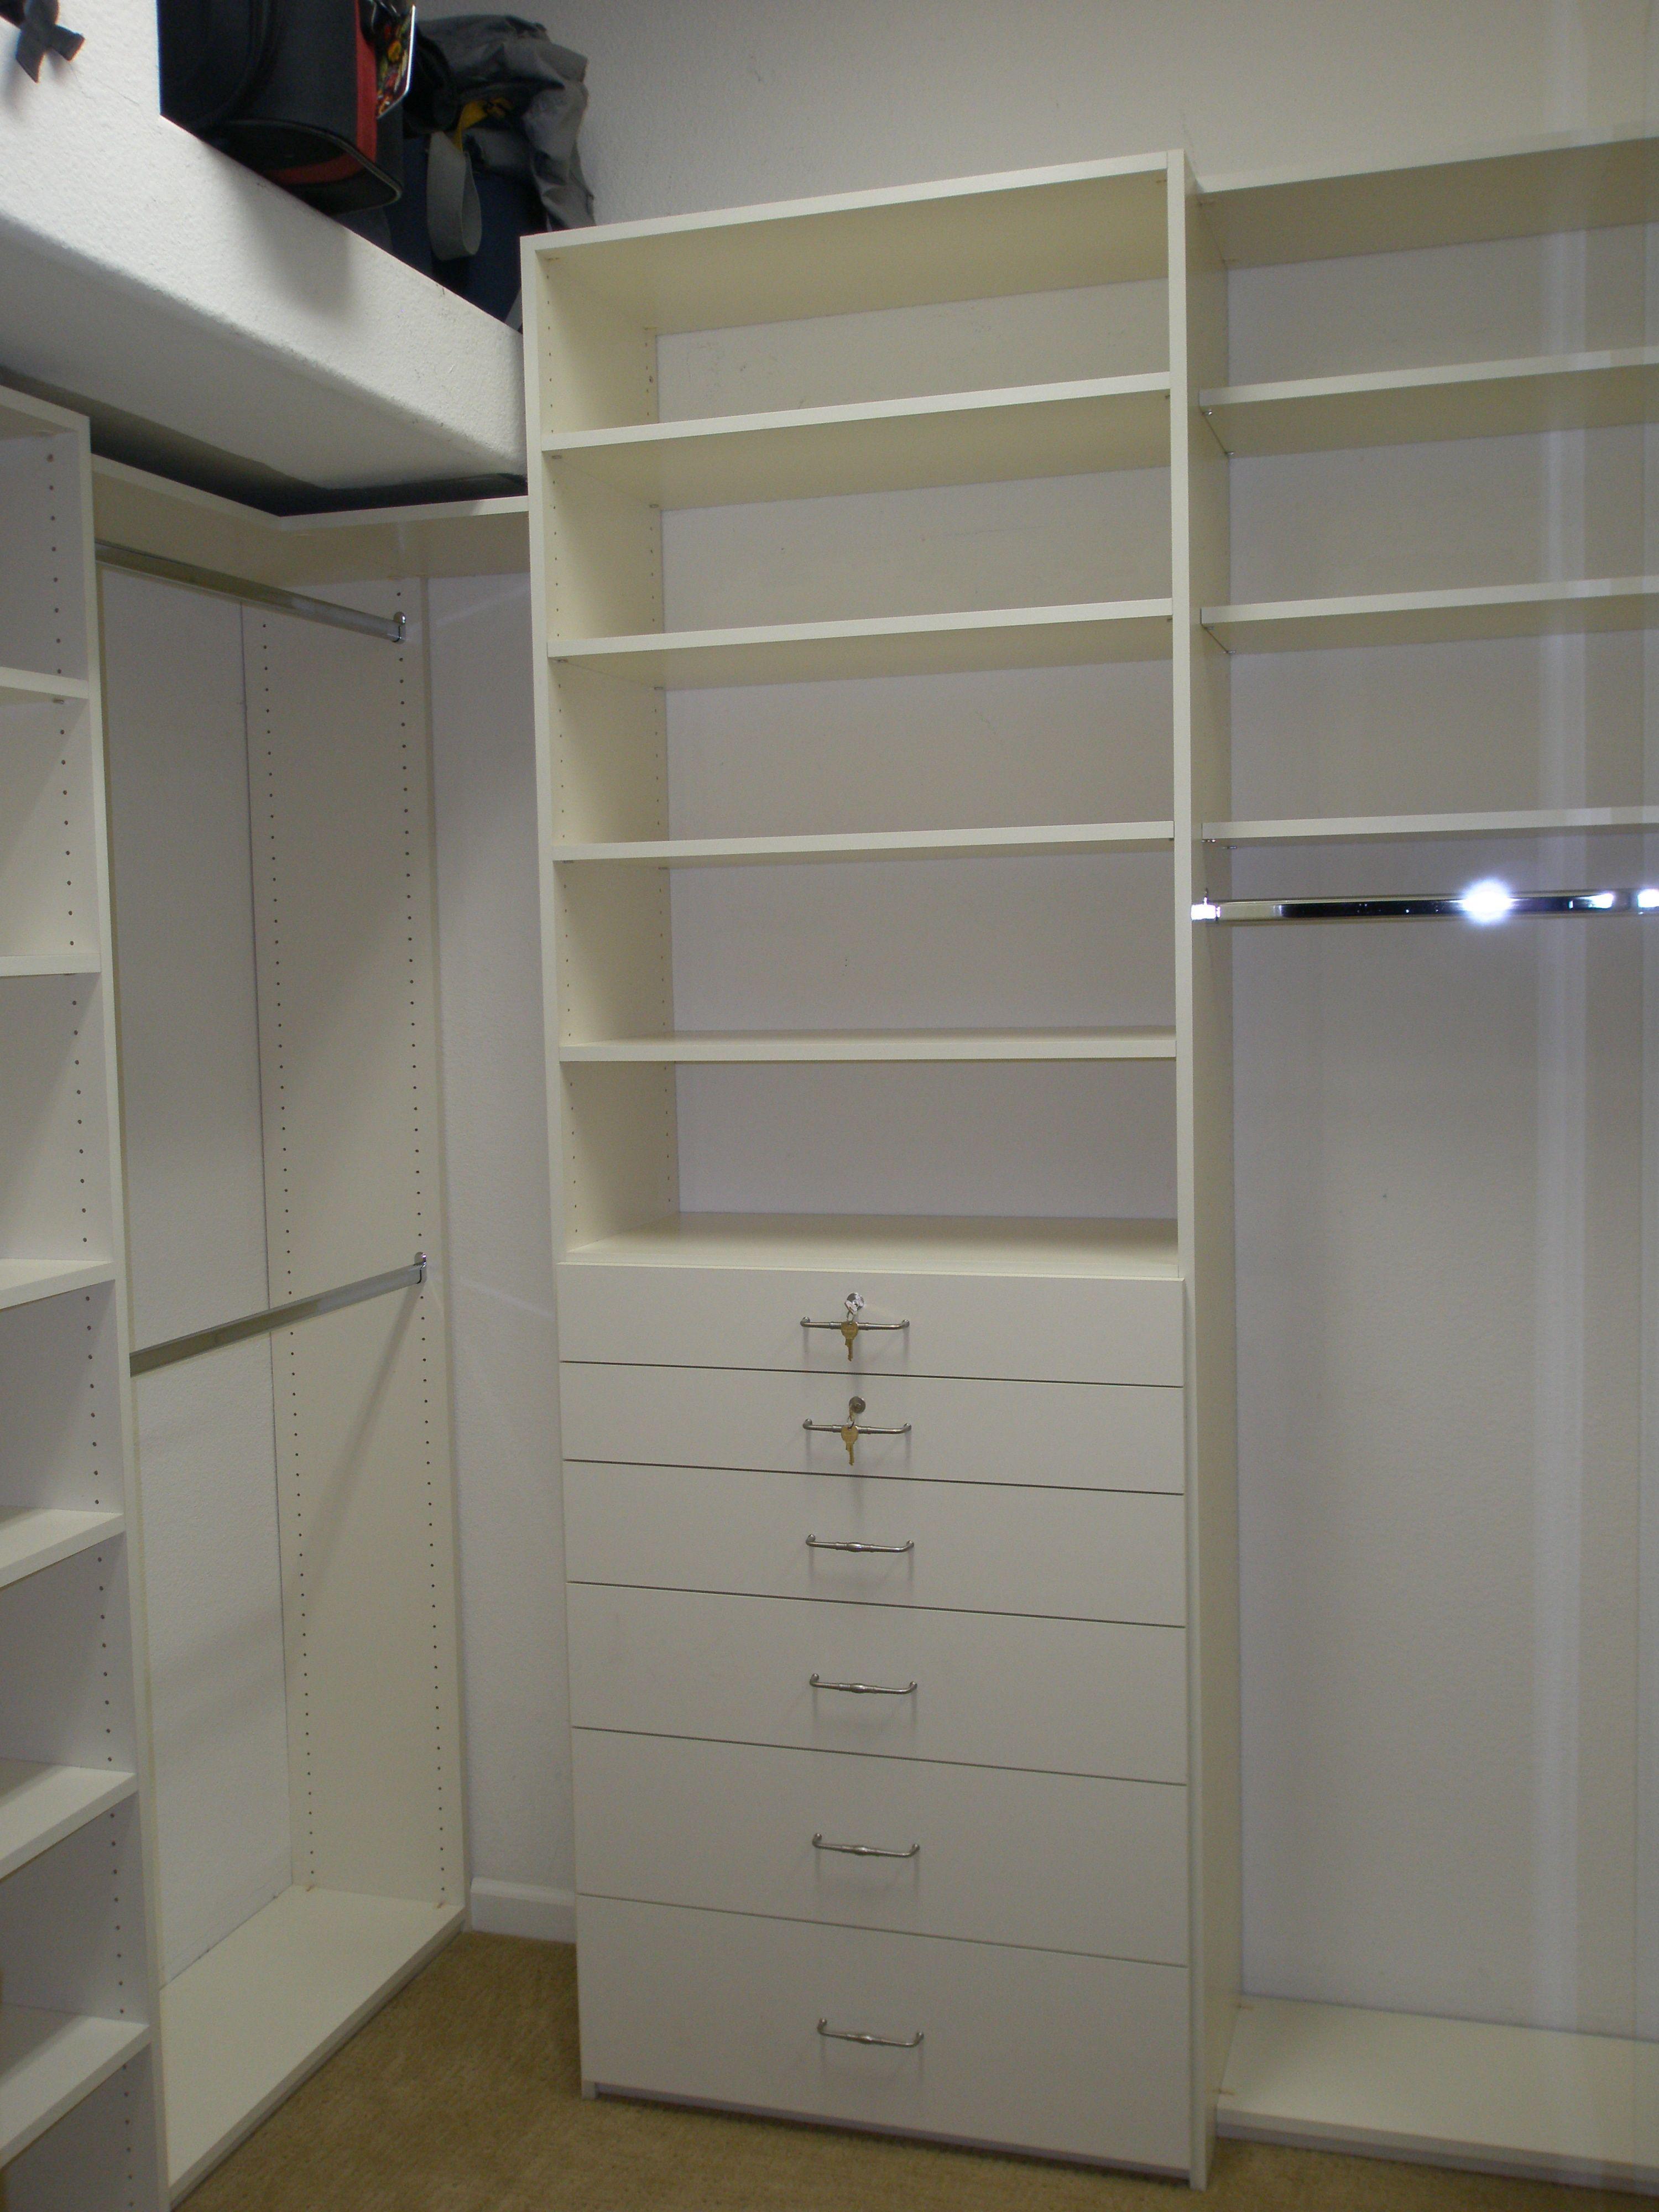 new img custom orleans master built drawers all designer closets closet for